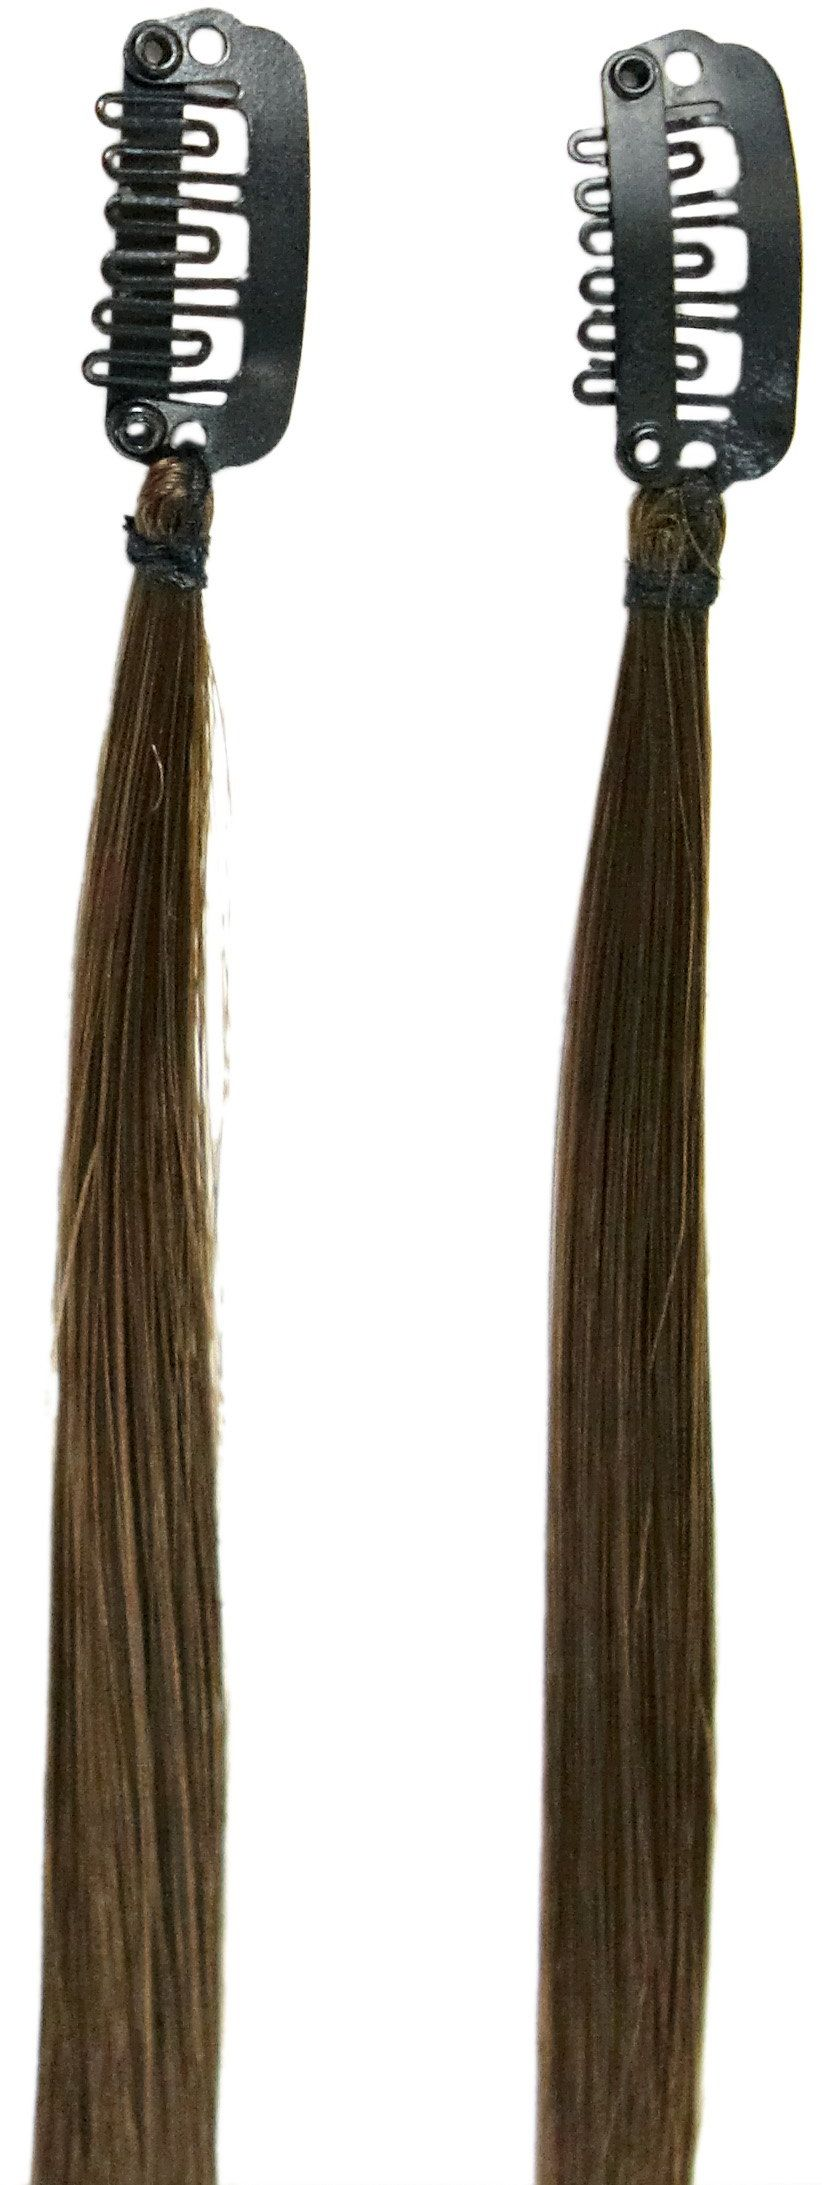 Love Hair Extensions Twinpack Clip-In-pasemka kolor 4  kasztanowy brązowy  41 cm, 1 opakowanie (1 x 1 sztuka)